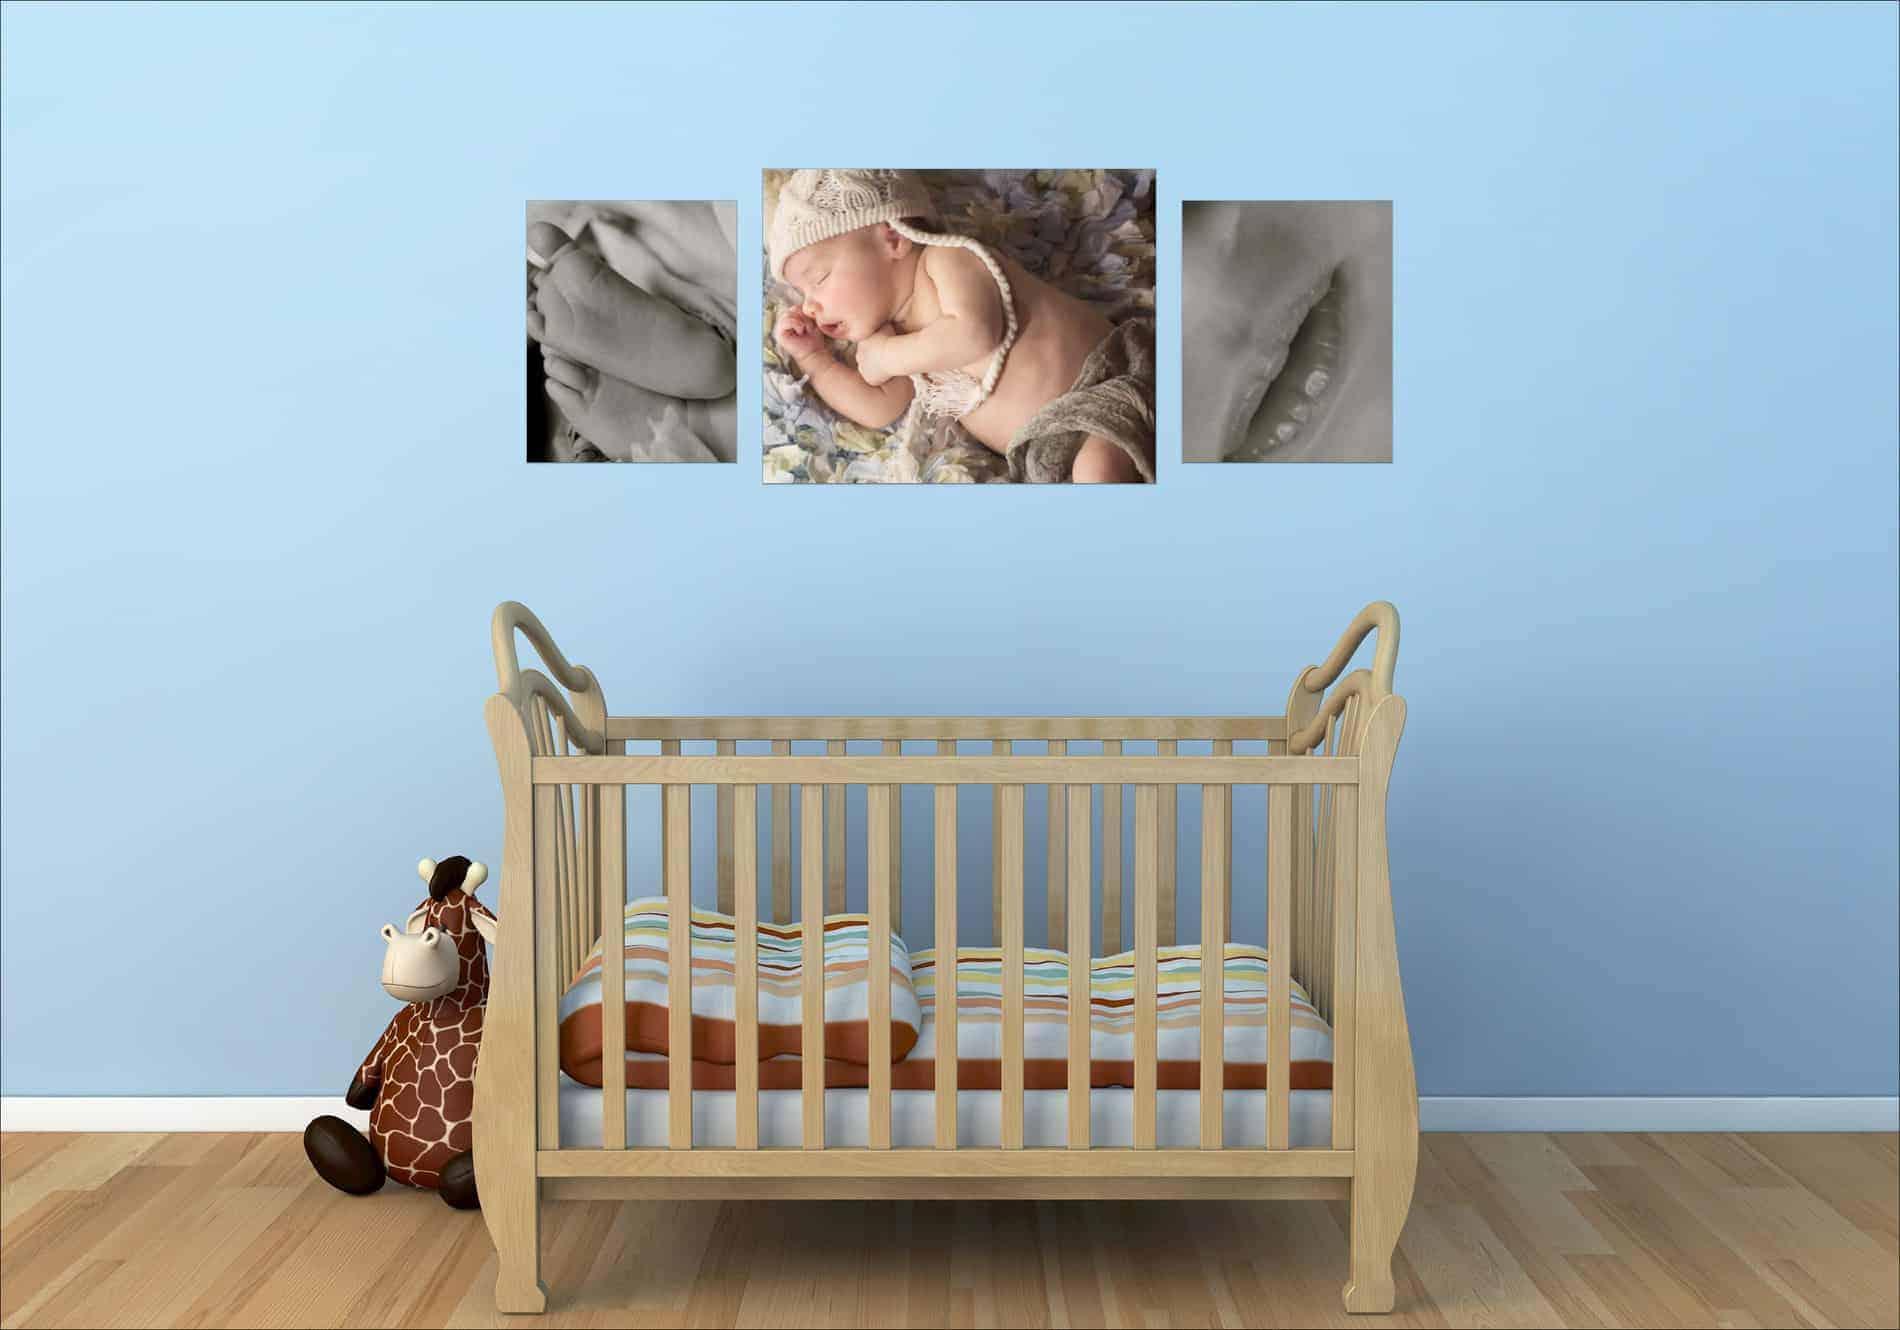 Newborn Baby Photos on Wall above Crib